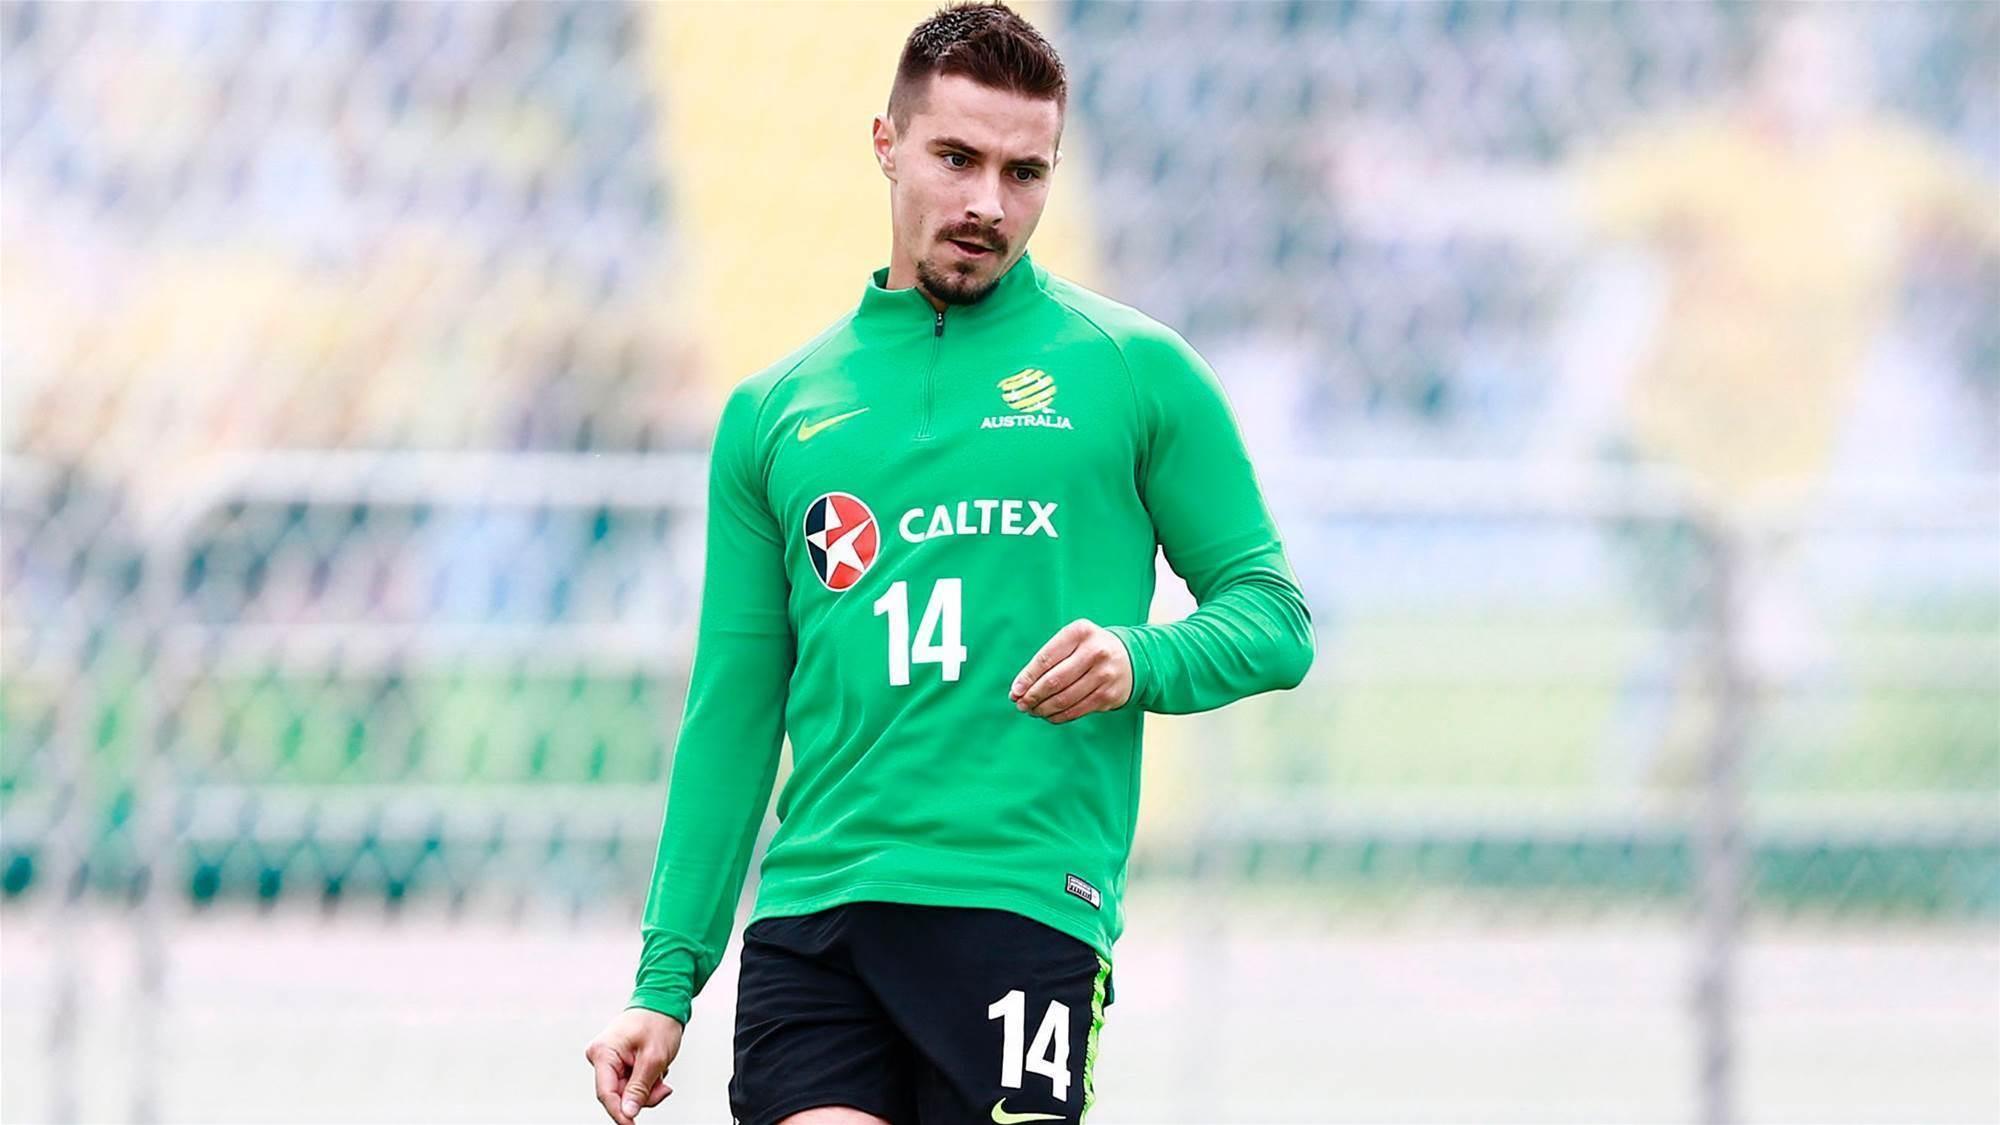 McCoist says Maclaren deserves a shot